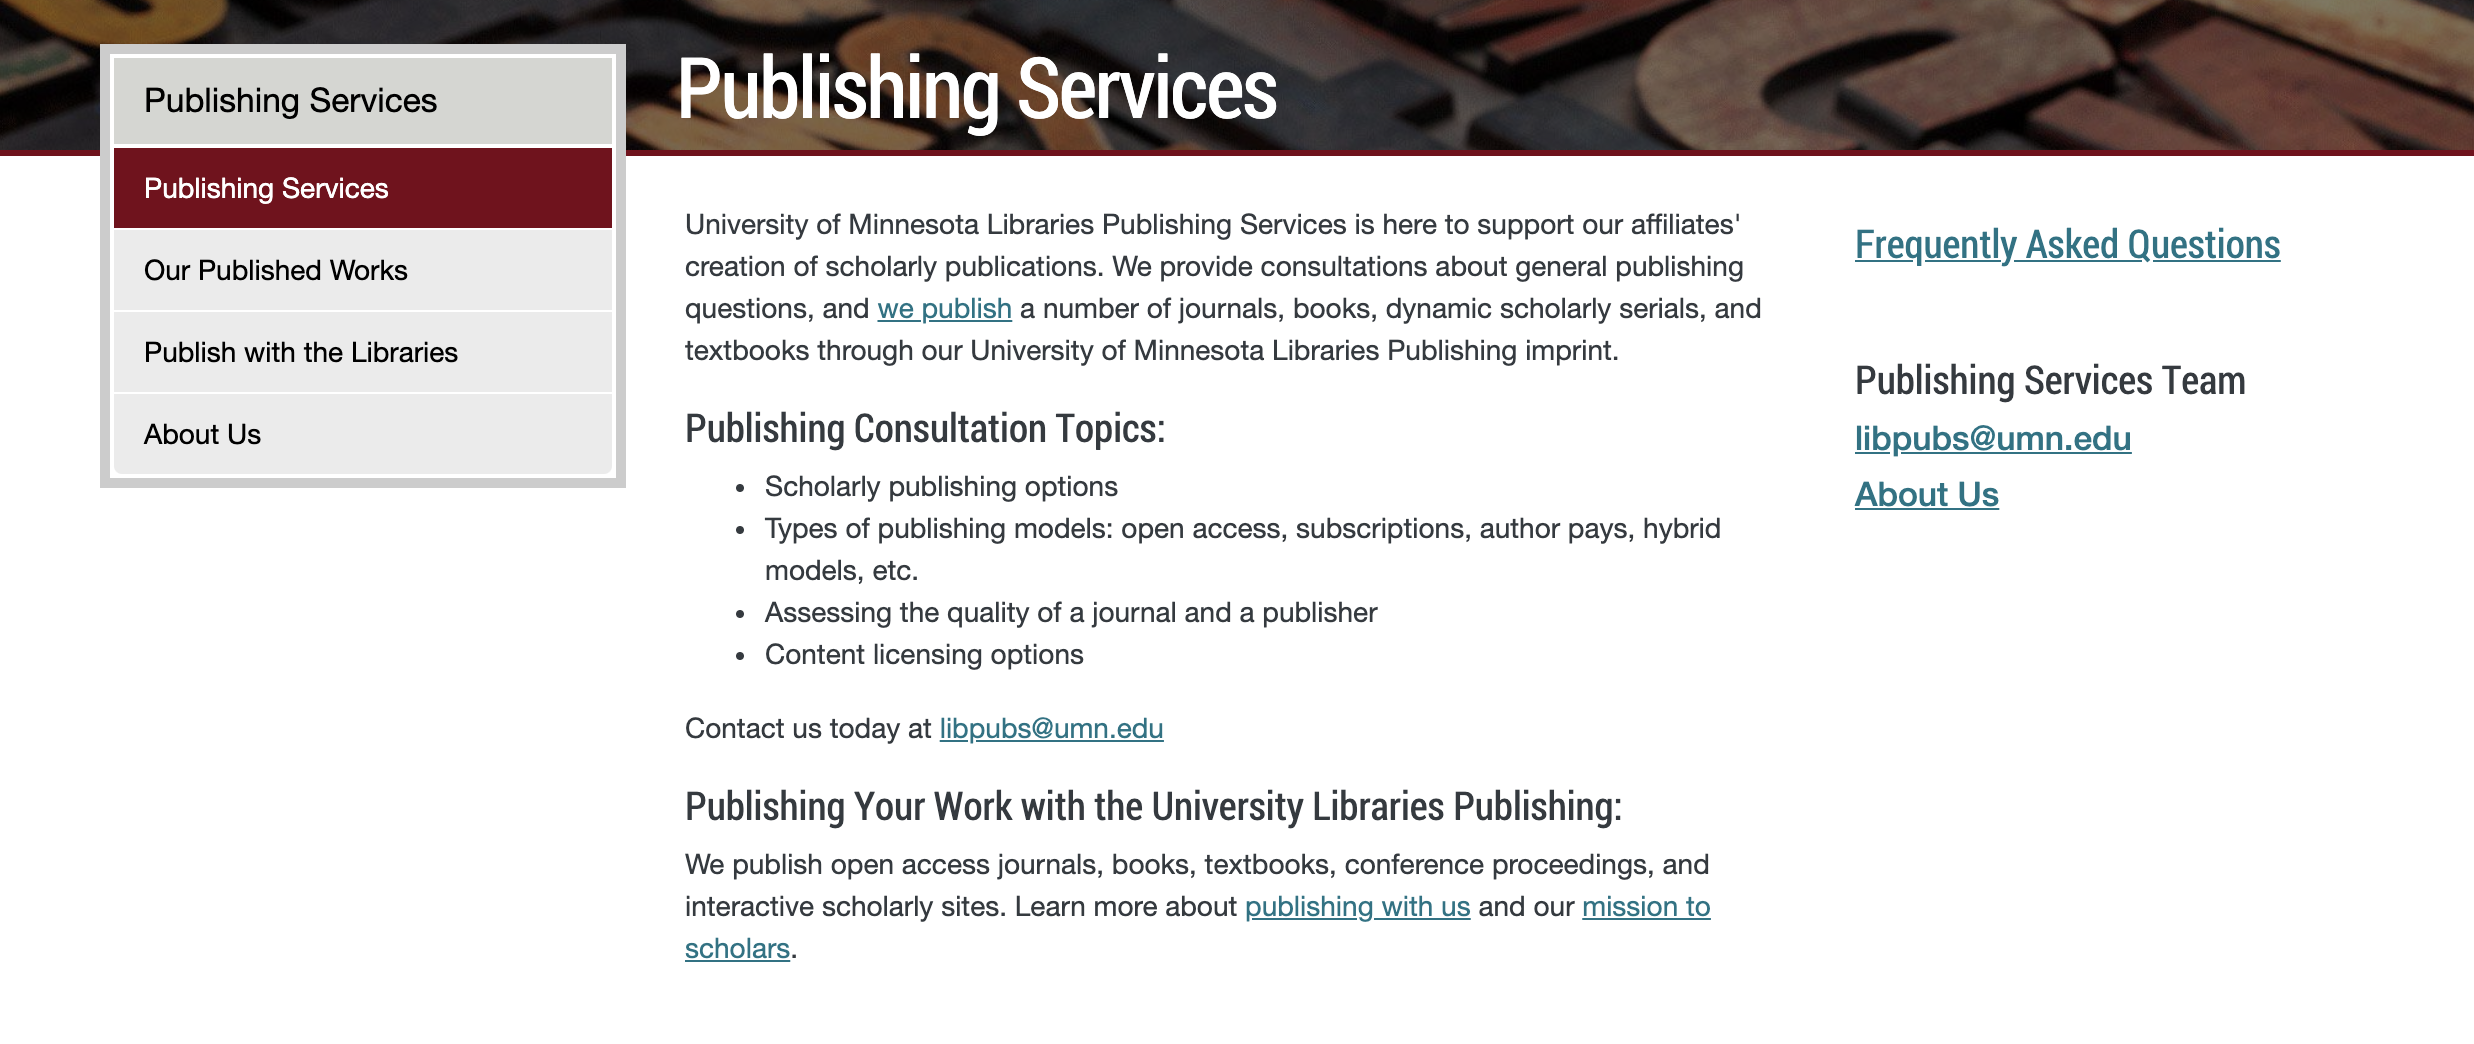 University of Minnesota Publishing Services